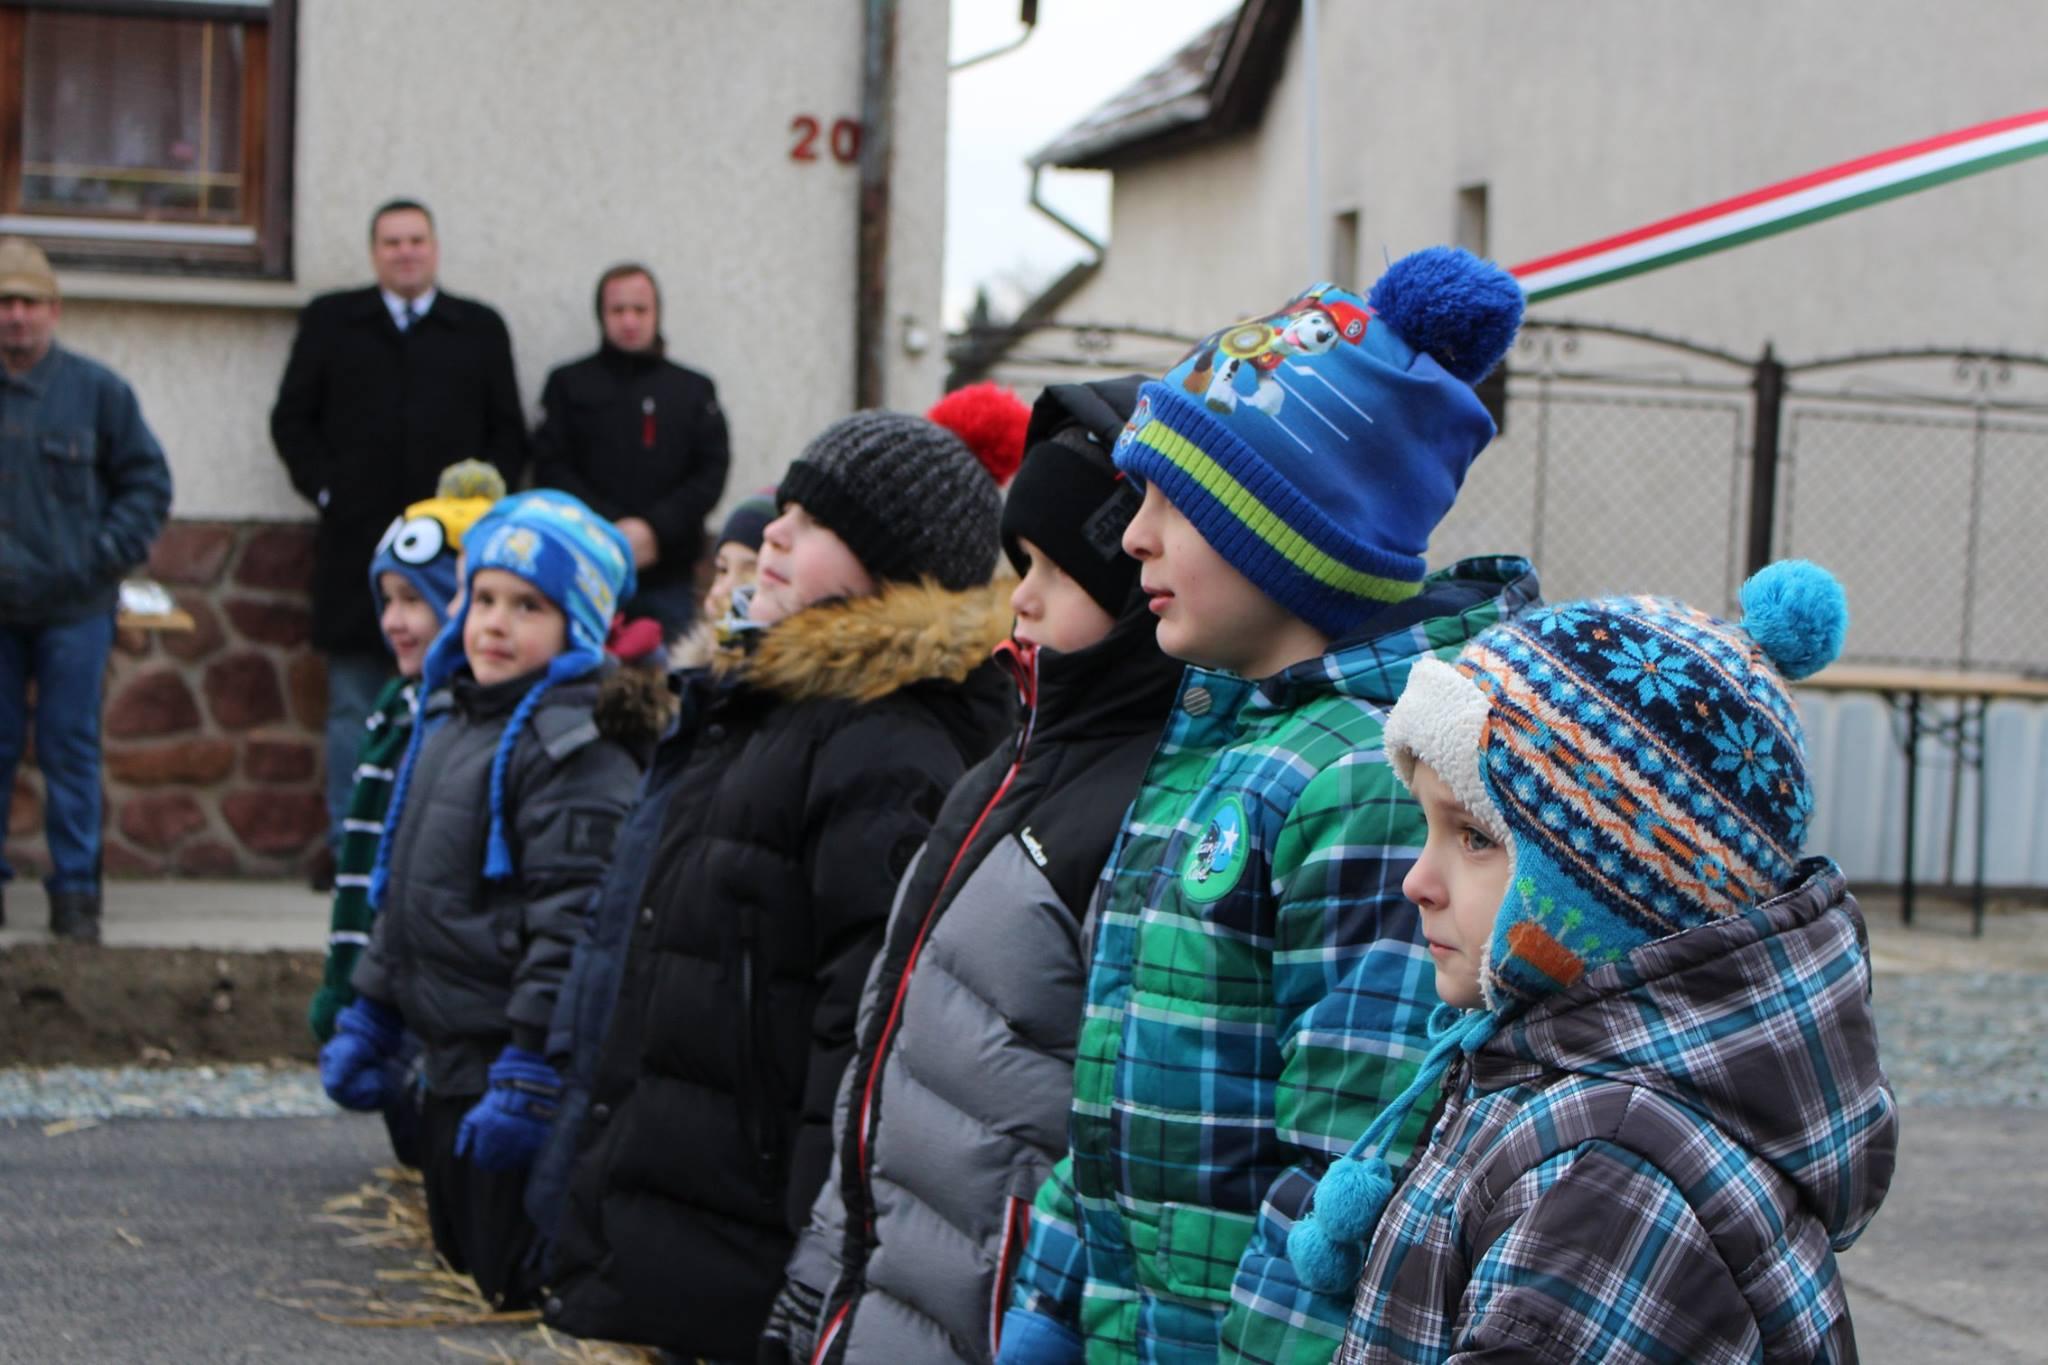 Ombudsmanhoz fordul a térdeltetett ovisok miatt Szél Bernadett